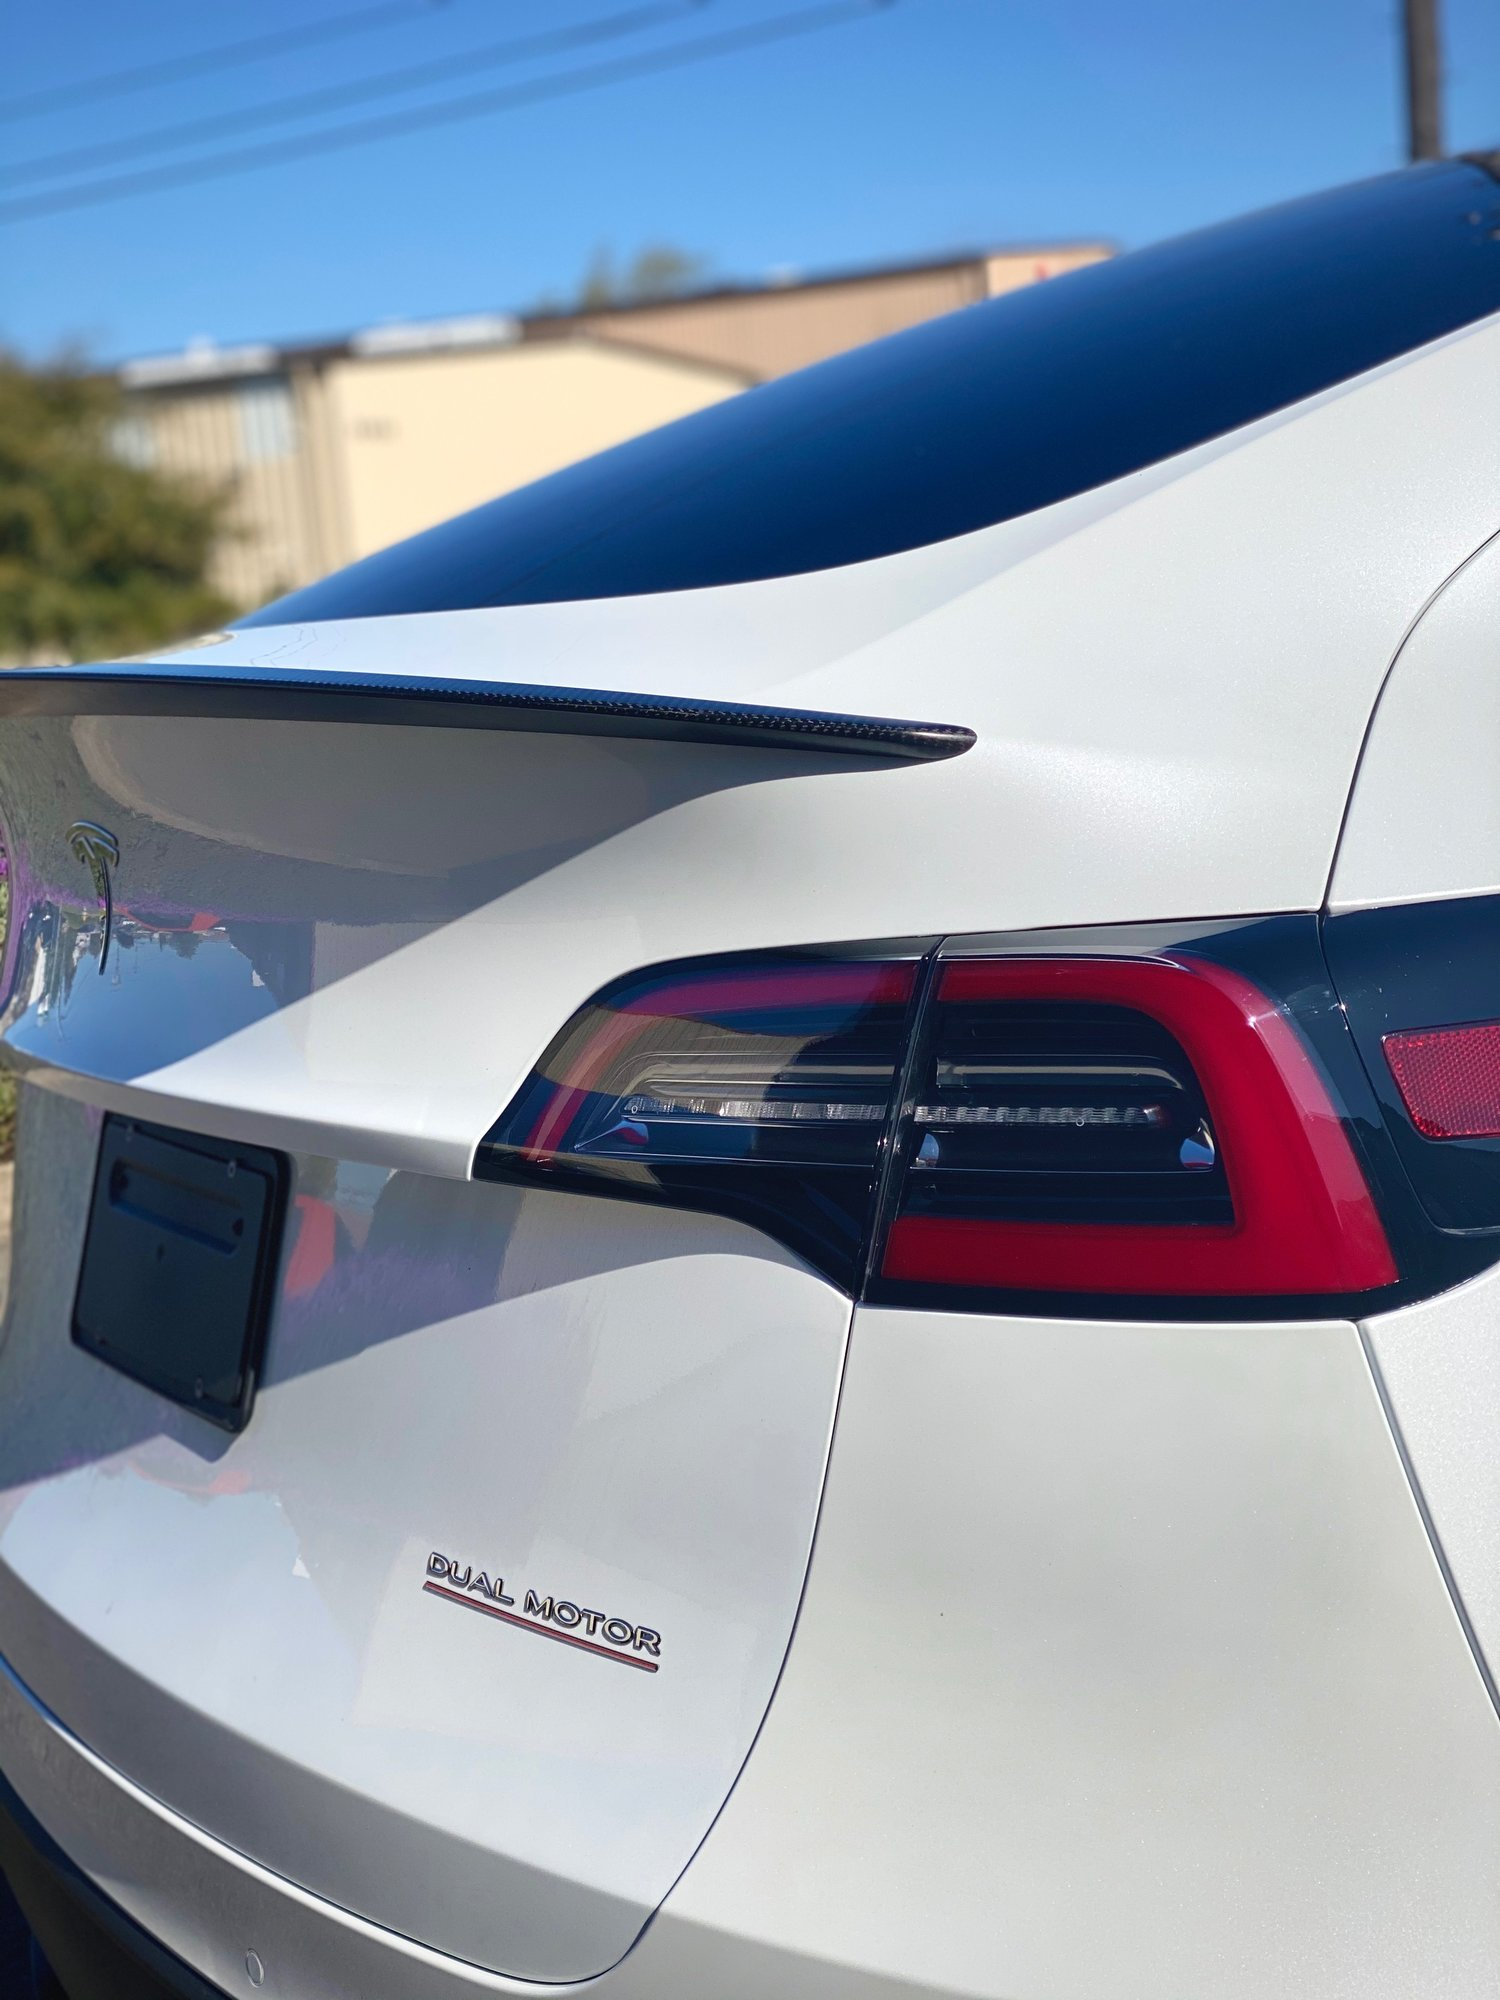 2020 Tesla Model Y Pearl White Multi-Coat  (Appearance Solutions-Sacramento,CA)~8.JPG